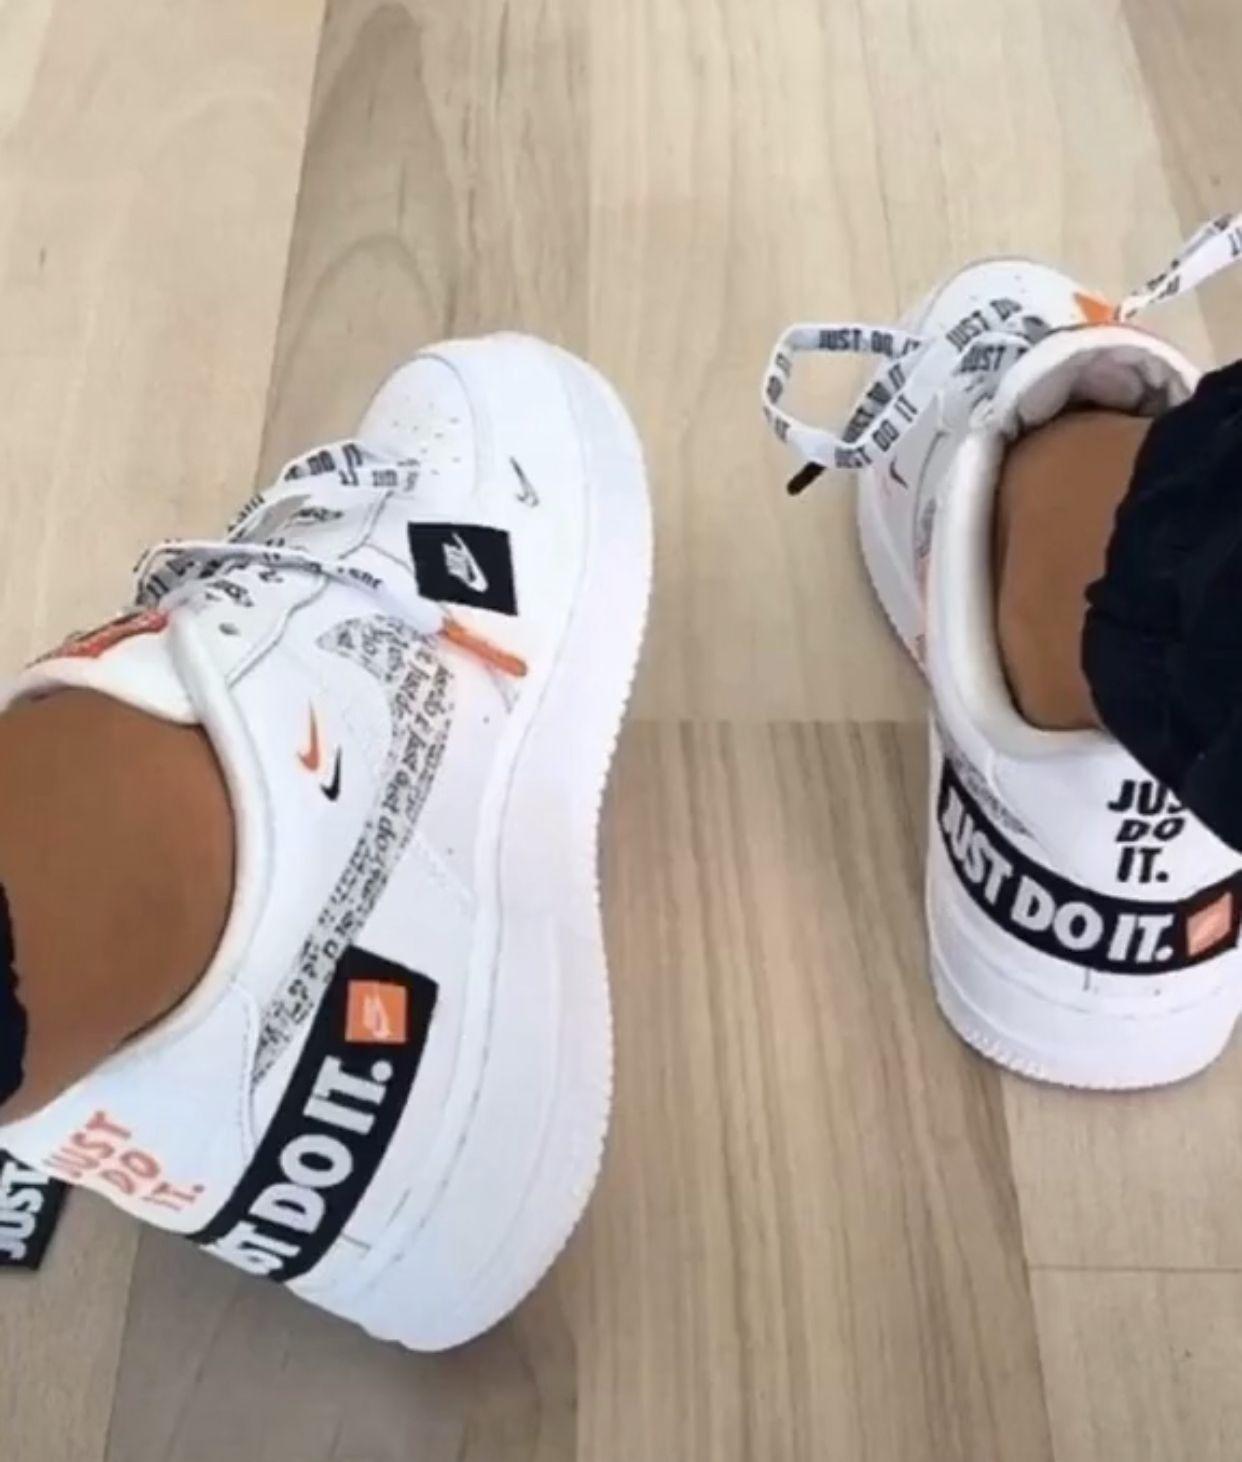 2018 Nike Air Force 1 07 Premium Just Do It White Black Total Orange In 2020 Shoes Nike Air Nike Airforce 1